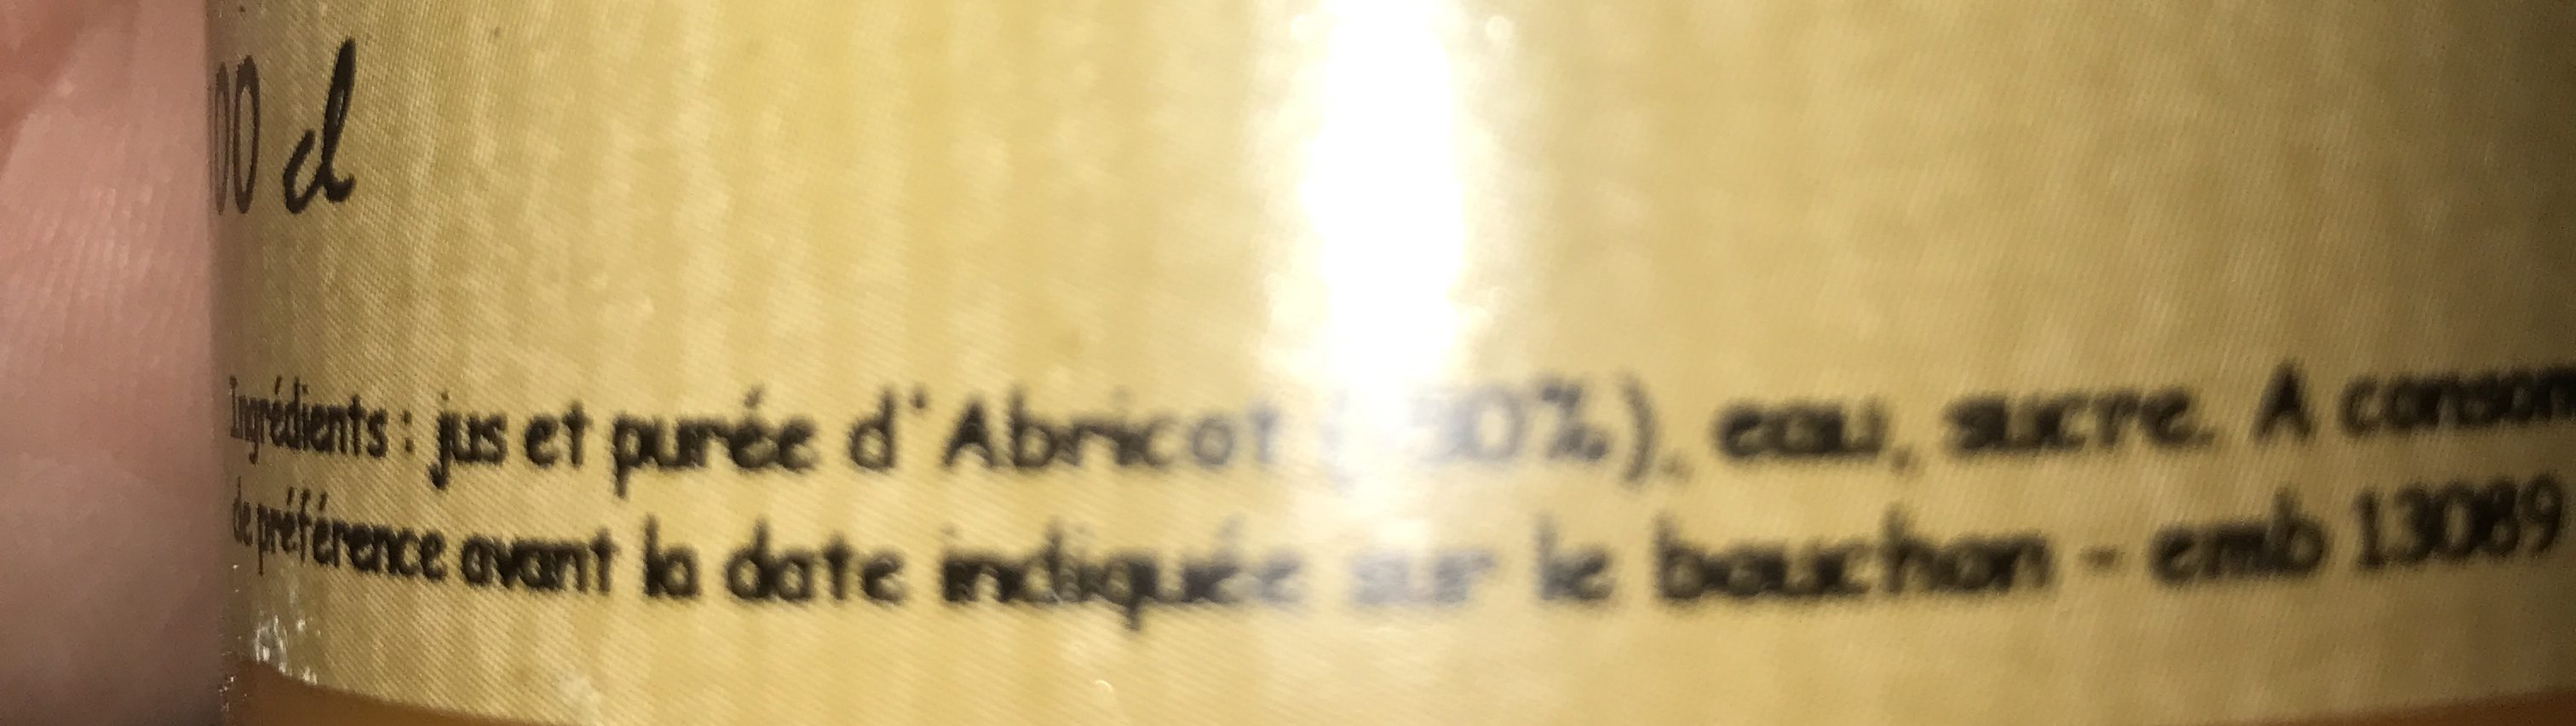 Nectar d'abricot - Ingredienti - fr